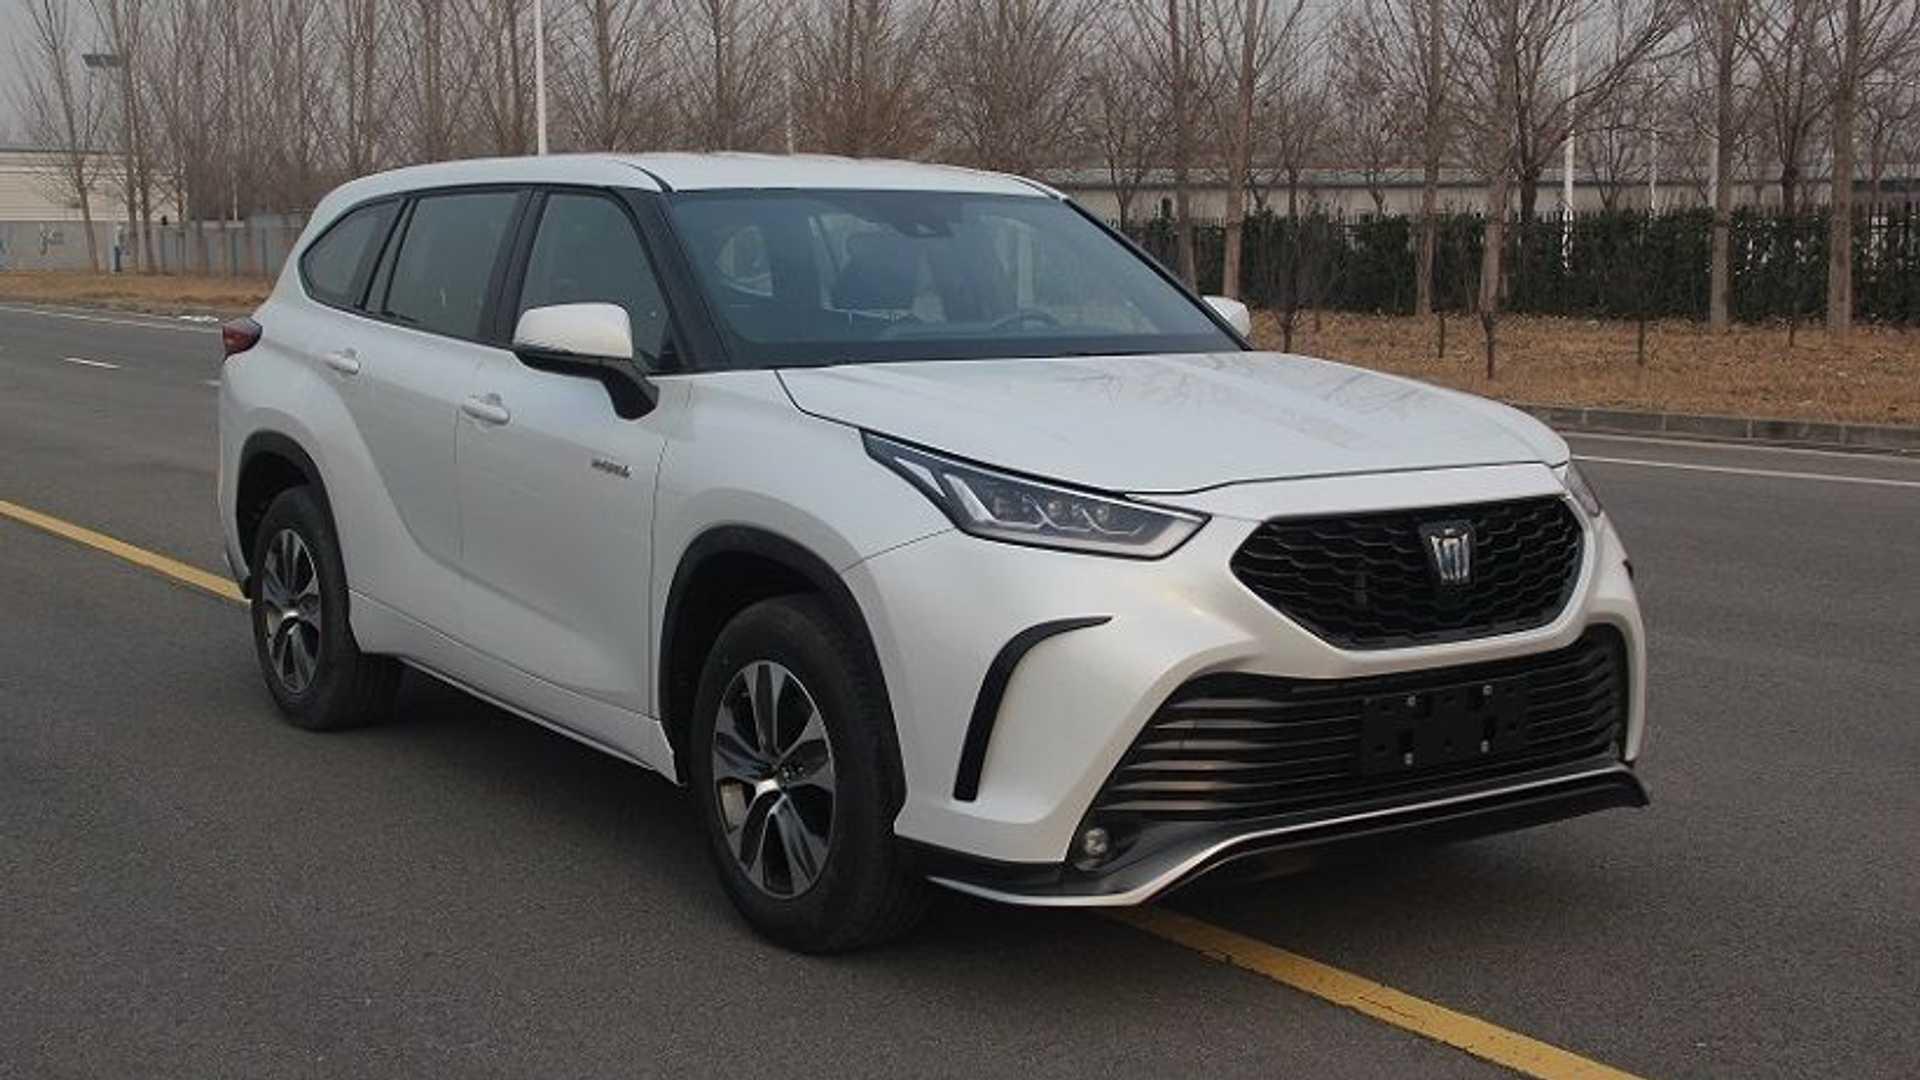 Toyota-Crown-Kugler-SUV-2